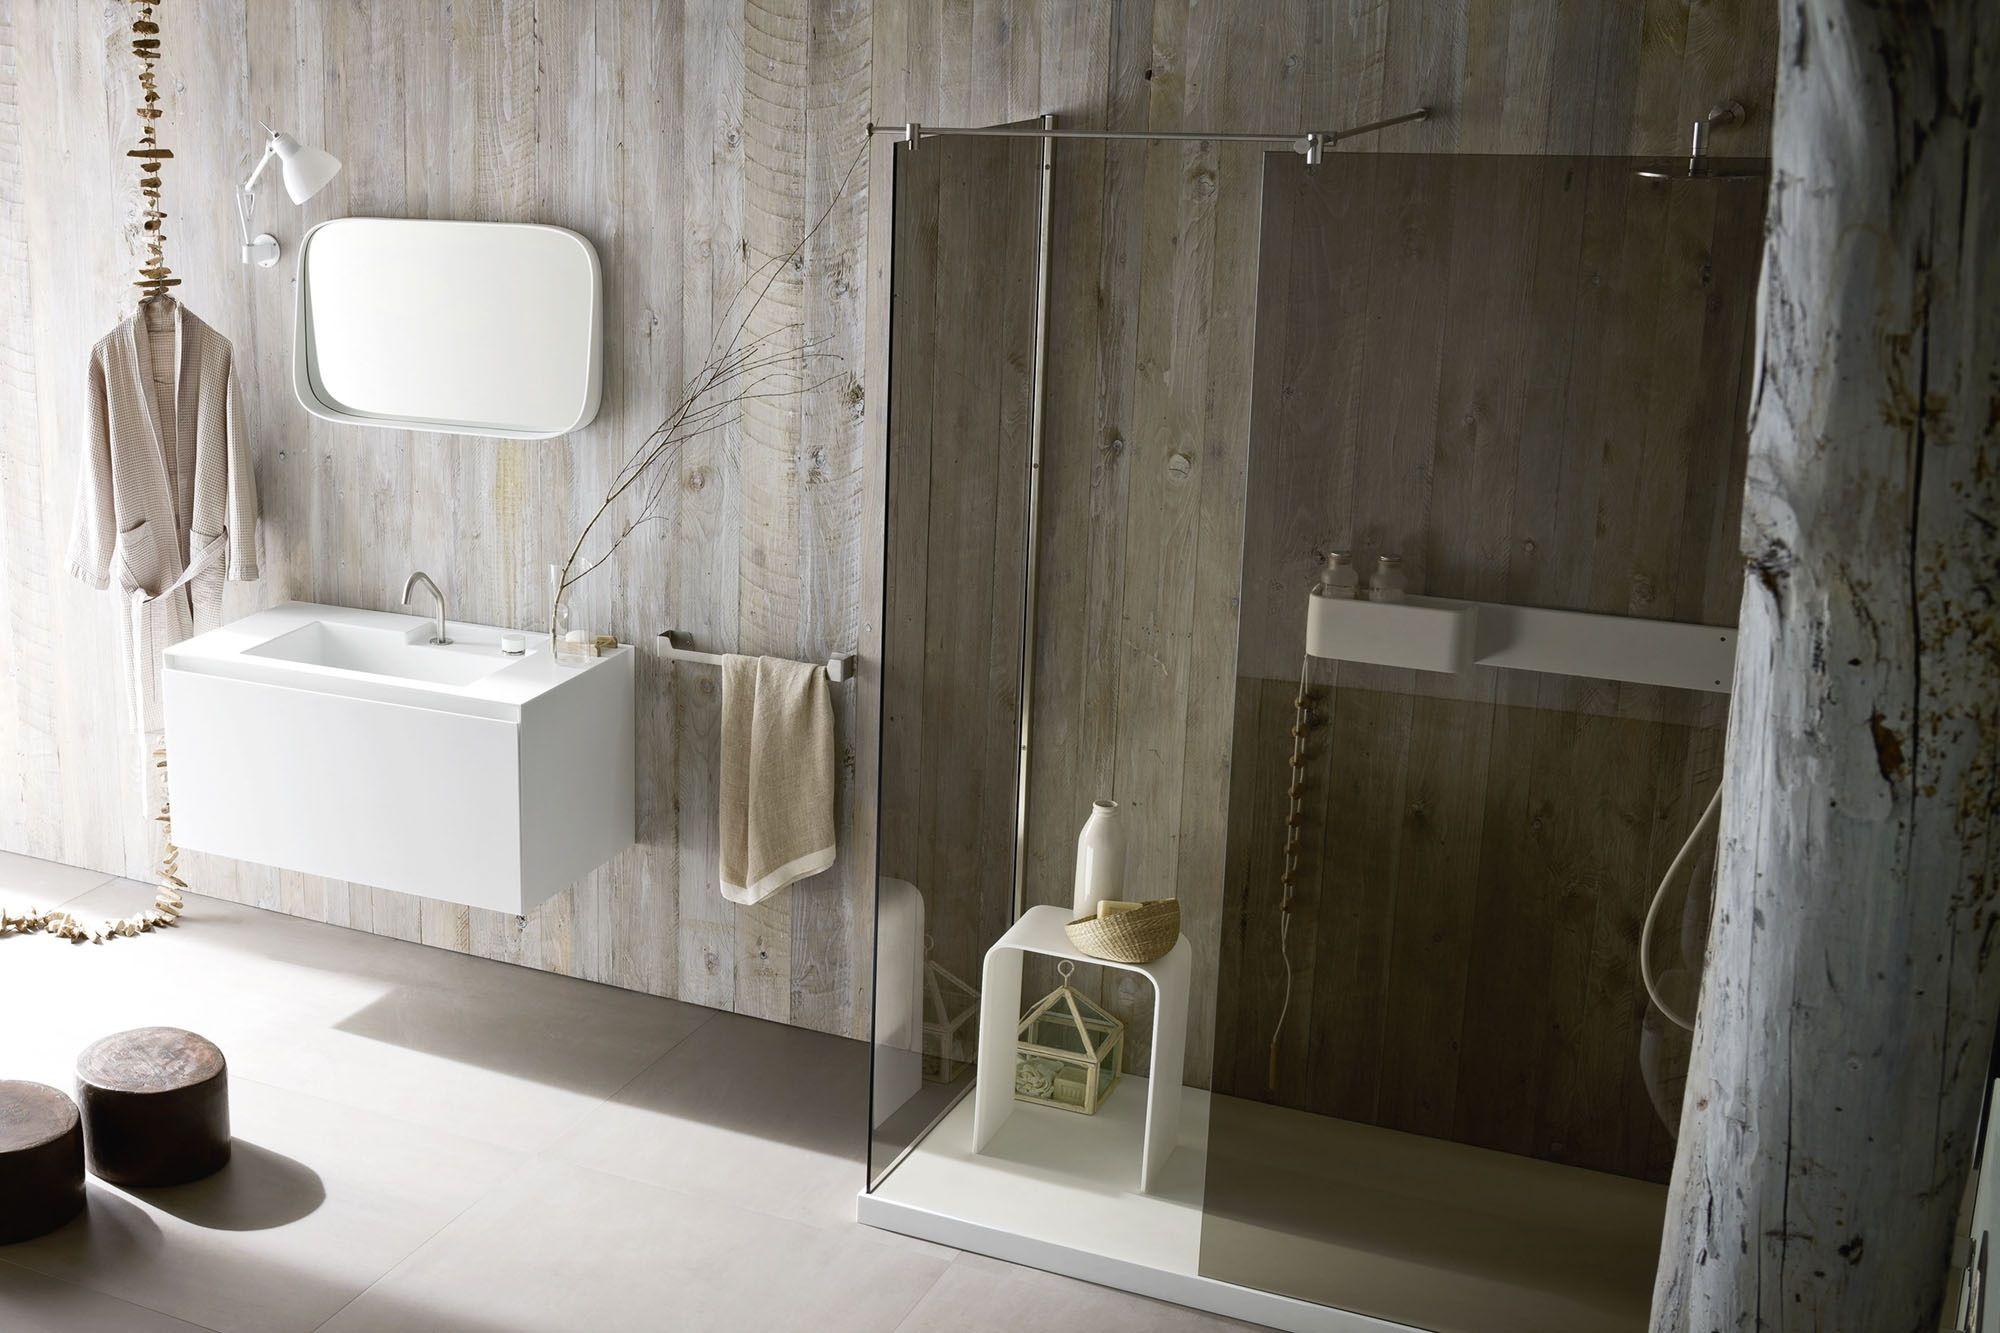 Душевая плита с трапом в ванной в стиле эко